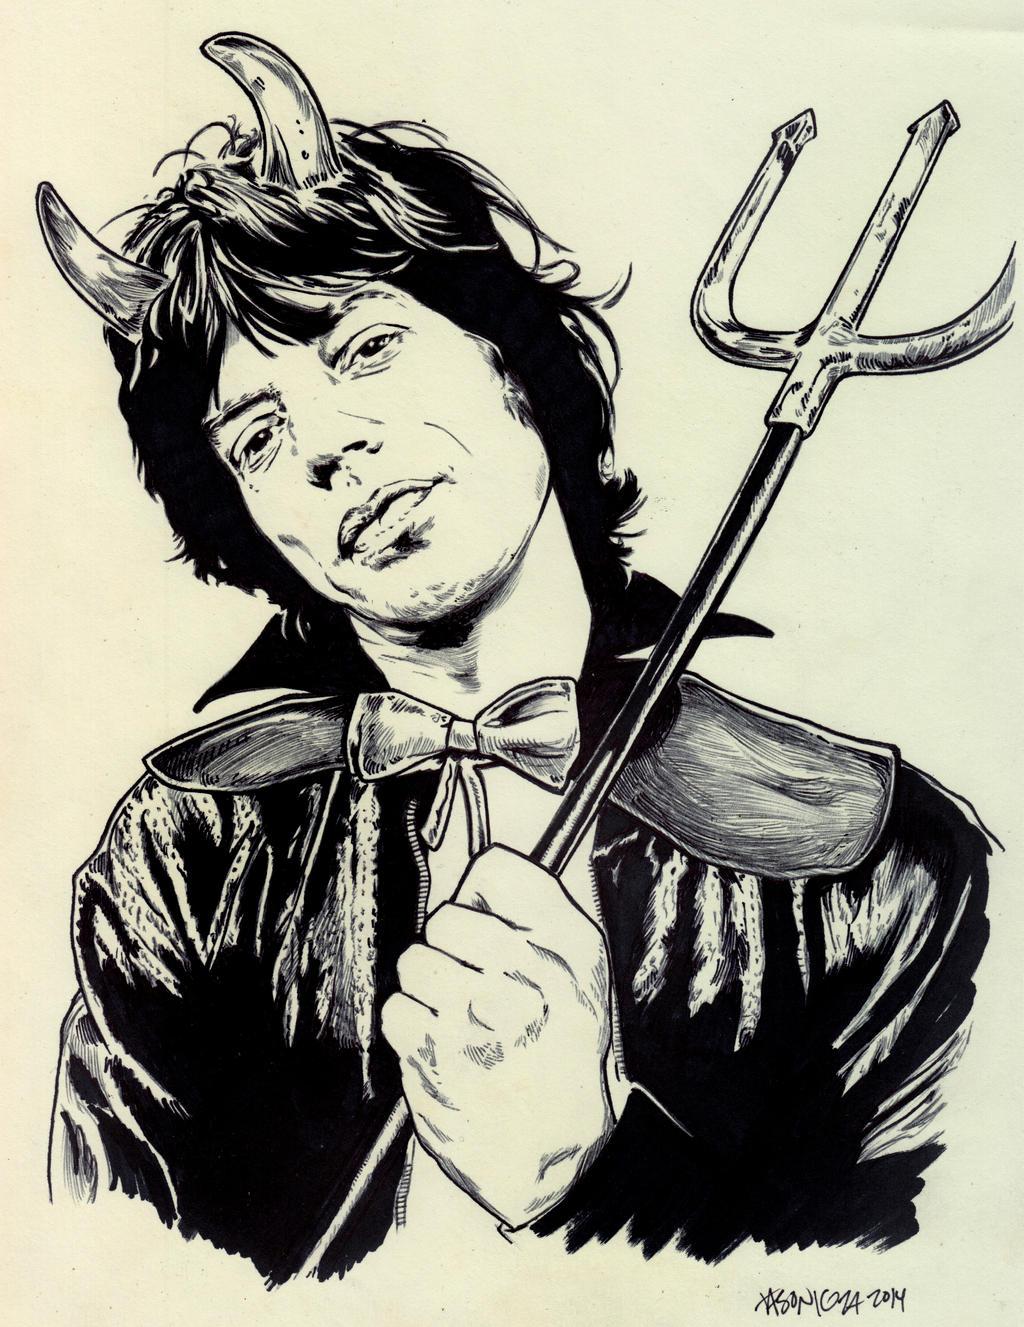 Mick Jagger - Sympathy For The Devil